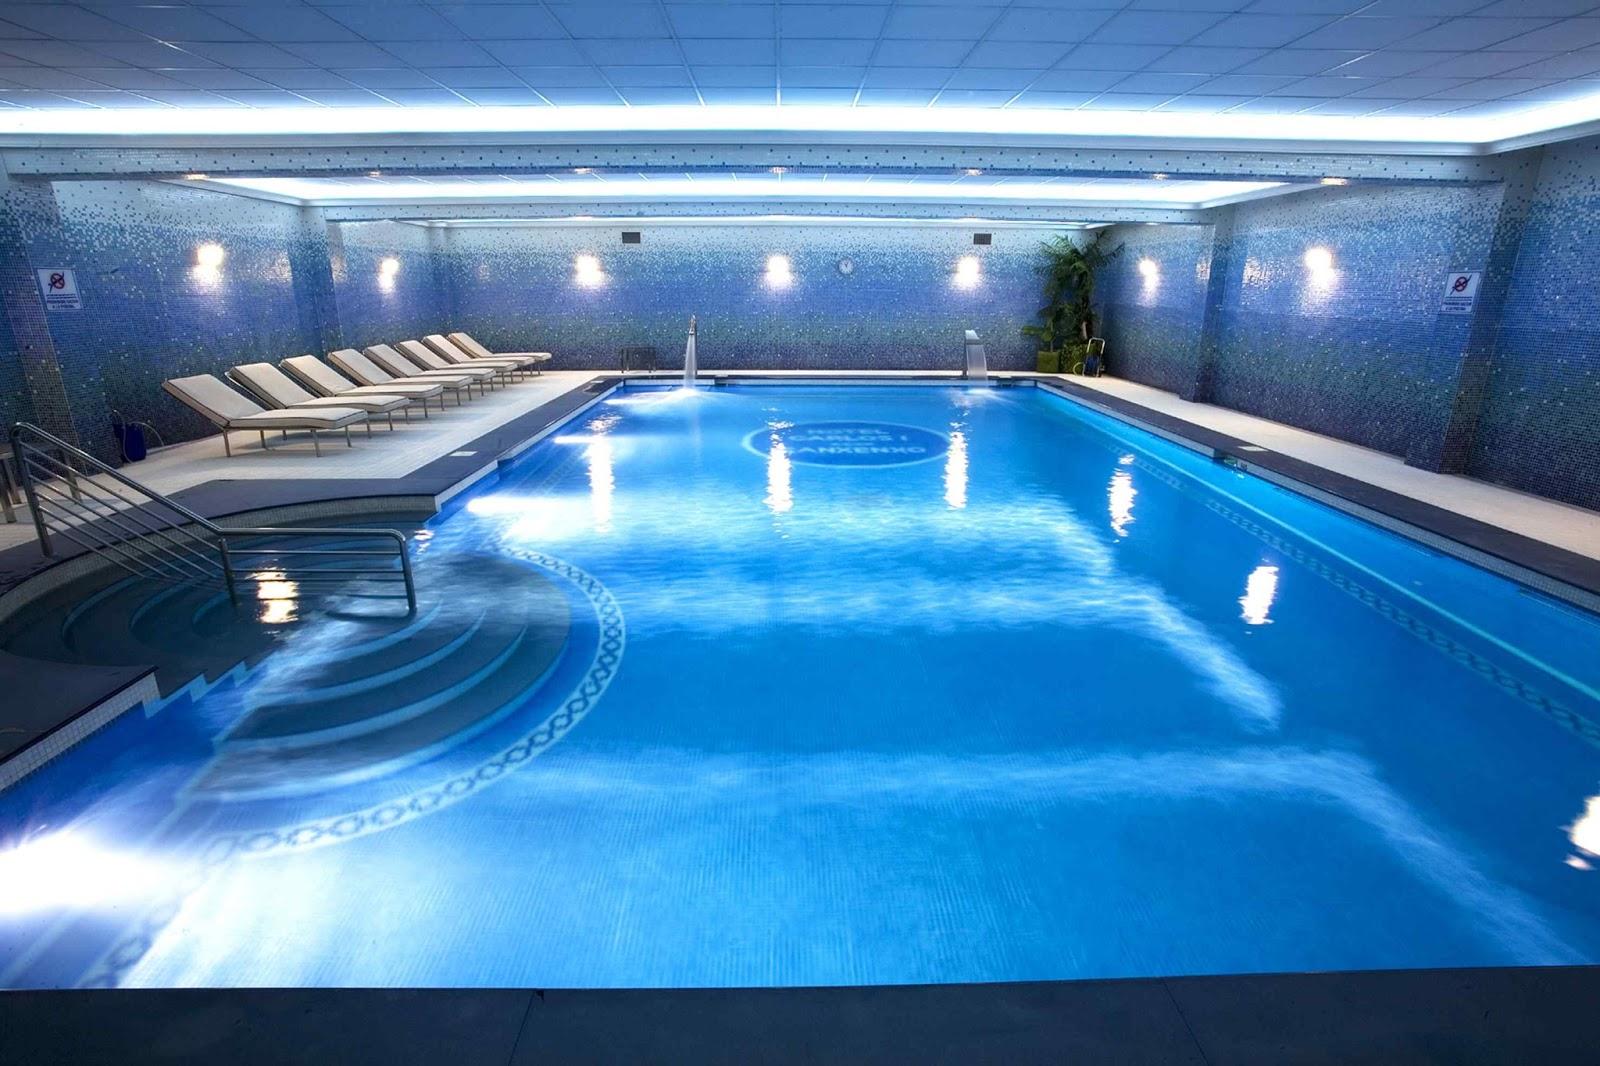 Las mejores piscinas del mundo la naturaleza nos sorprende for Piscina climatizada benidorm